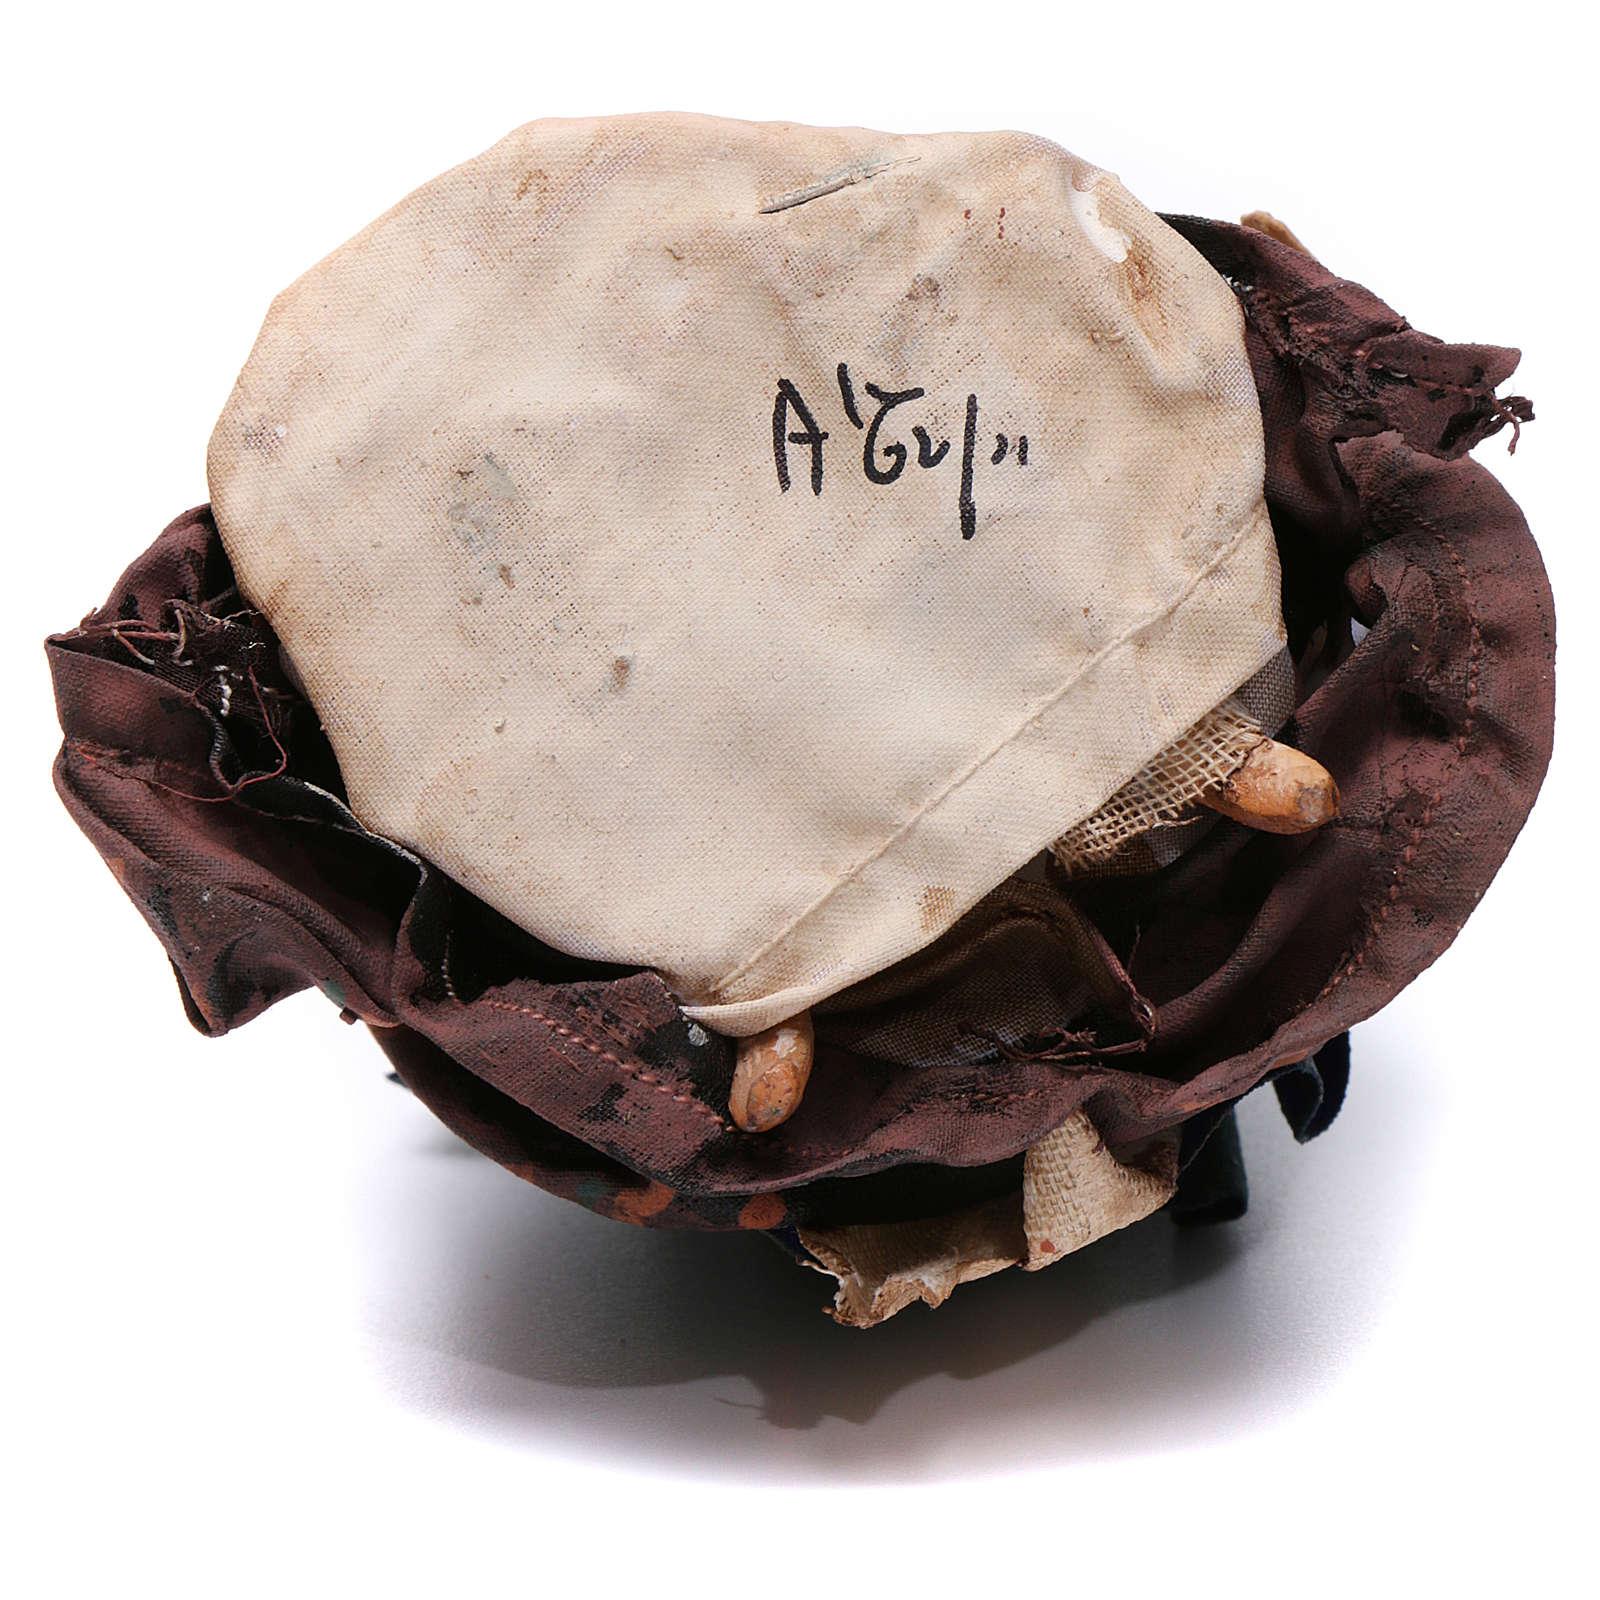 Natività Angela Tripi 13 cm - 3 pz 4